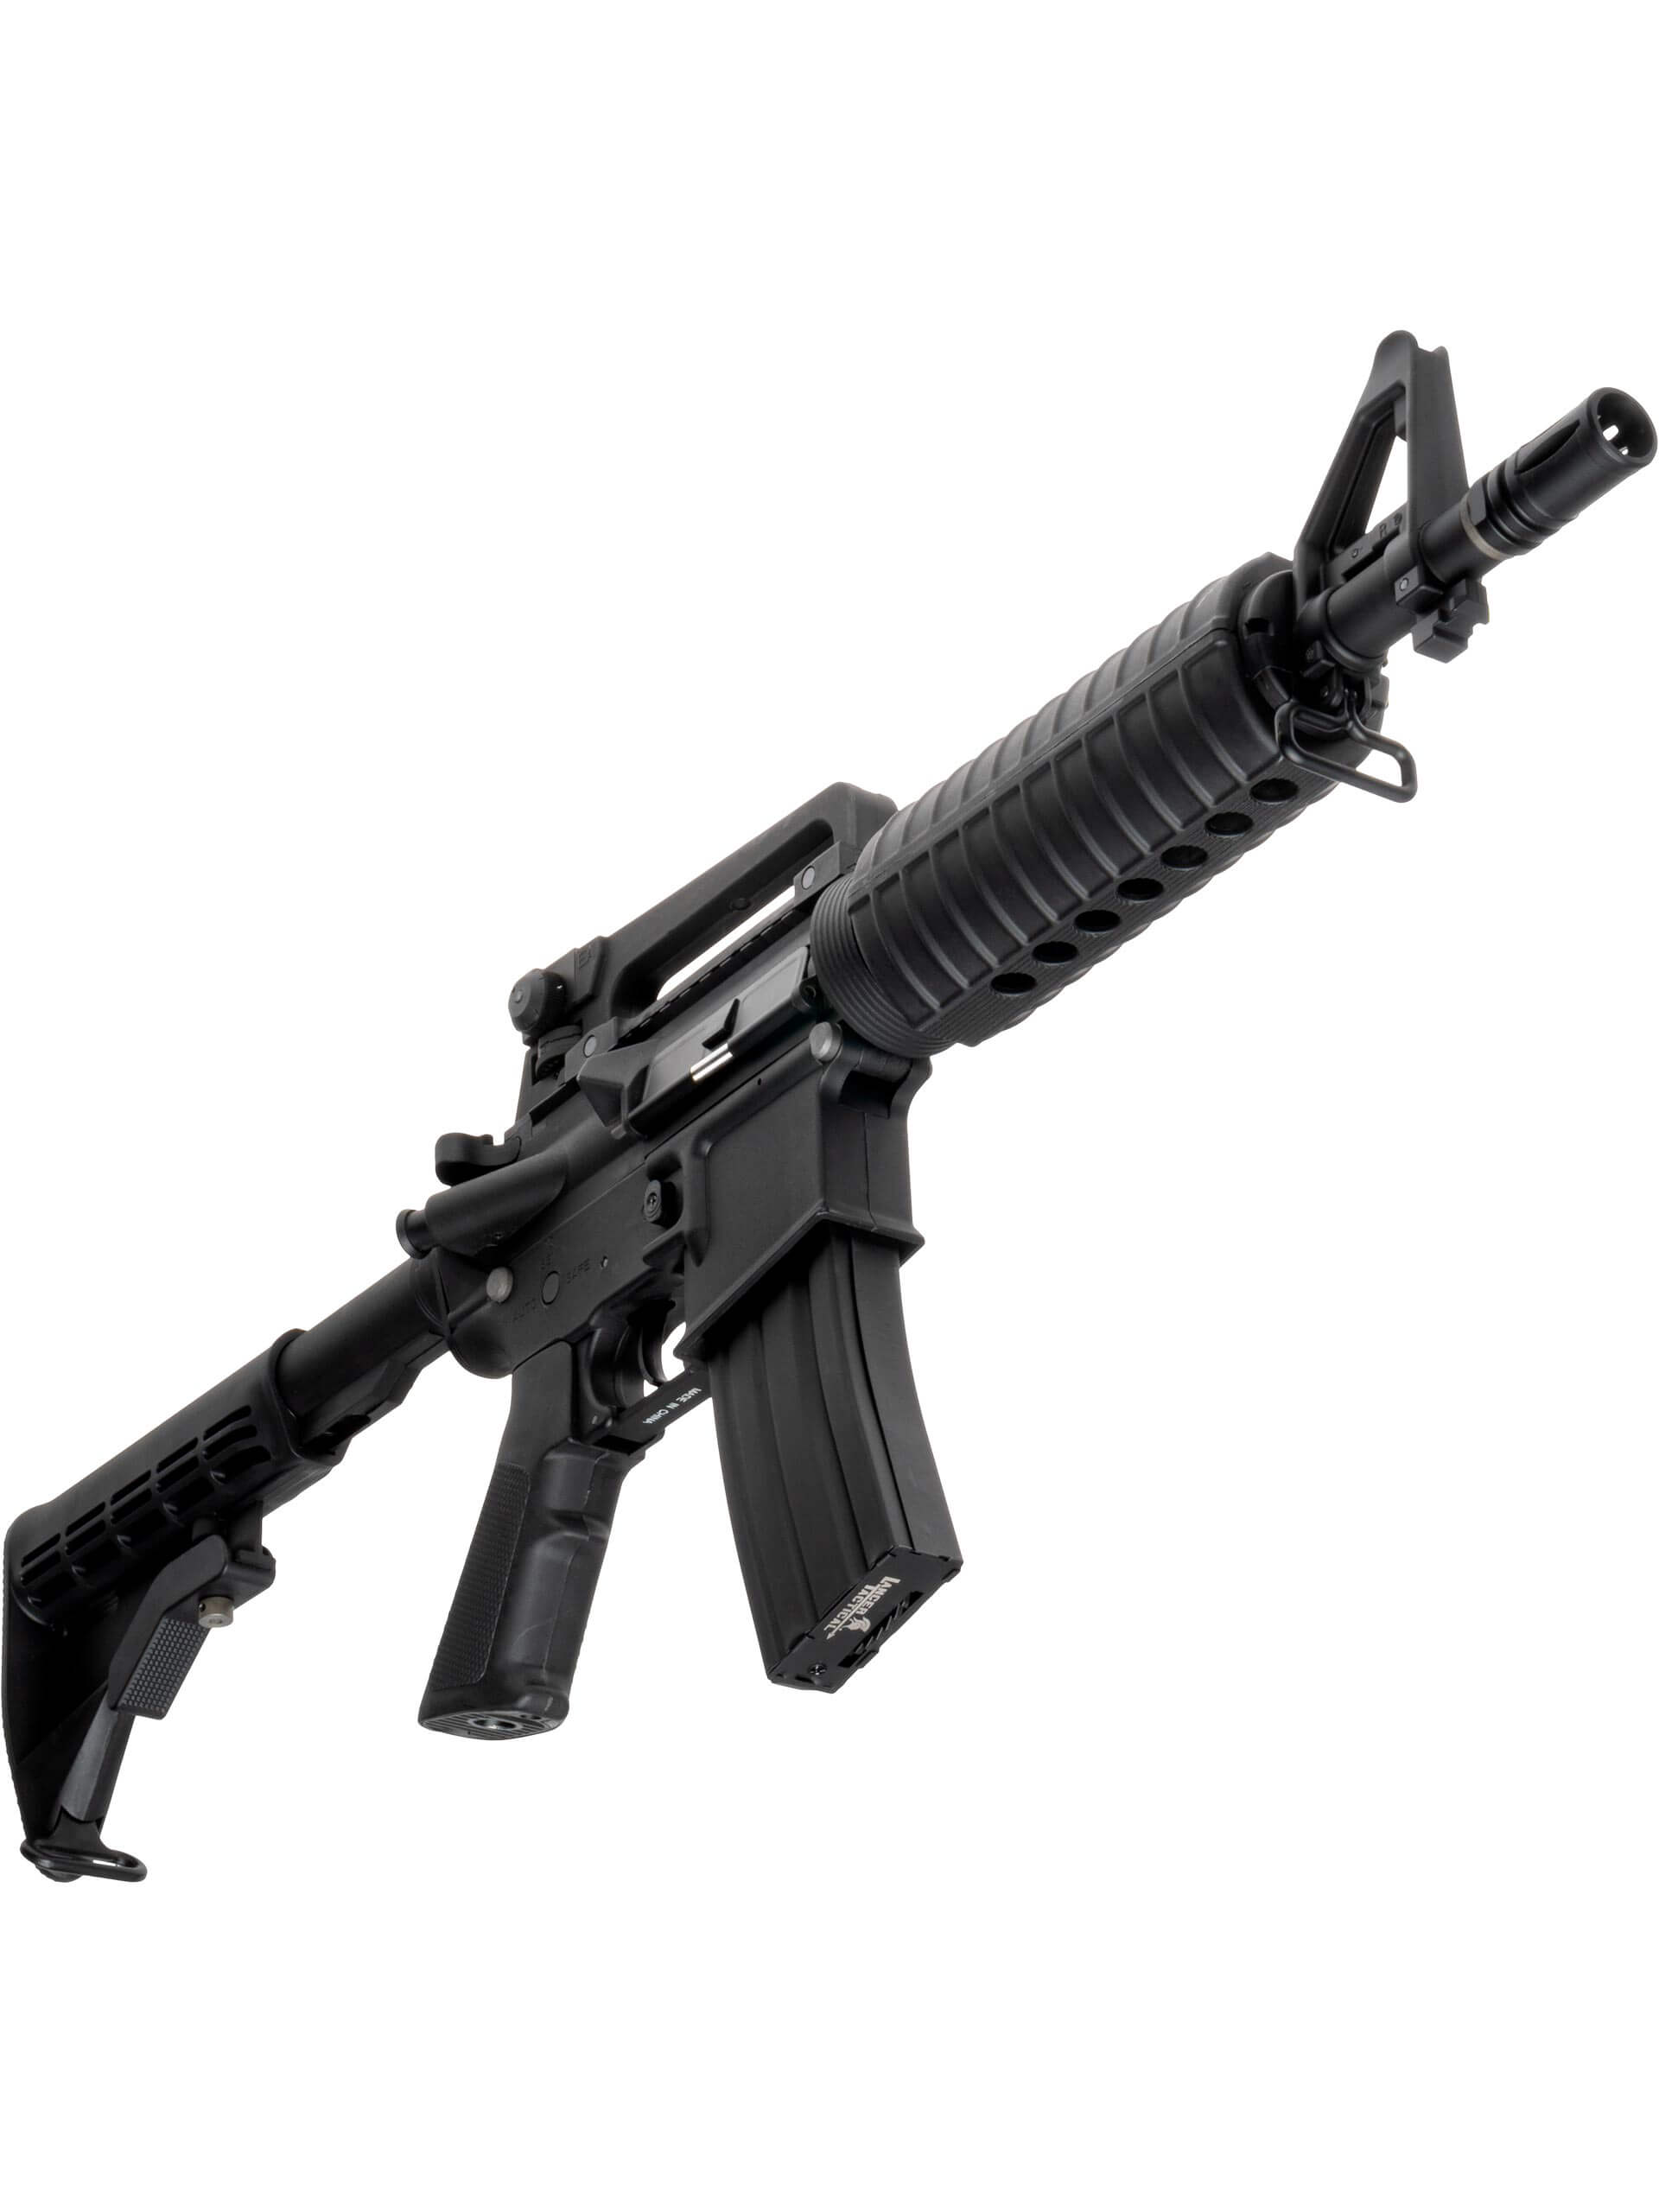 Lancer Tactical M933 Commando AEG Gen.2